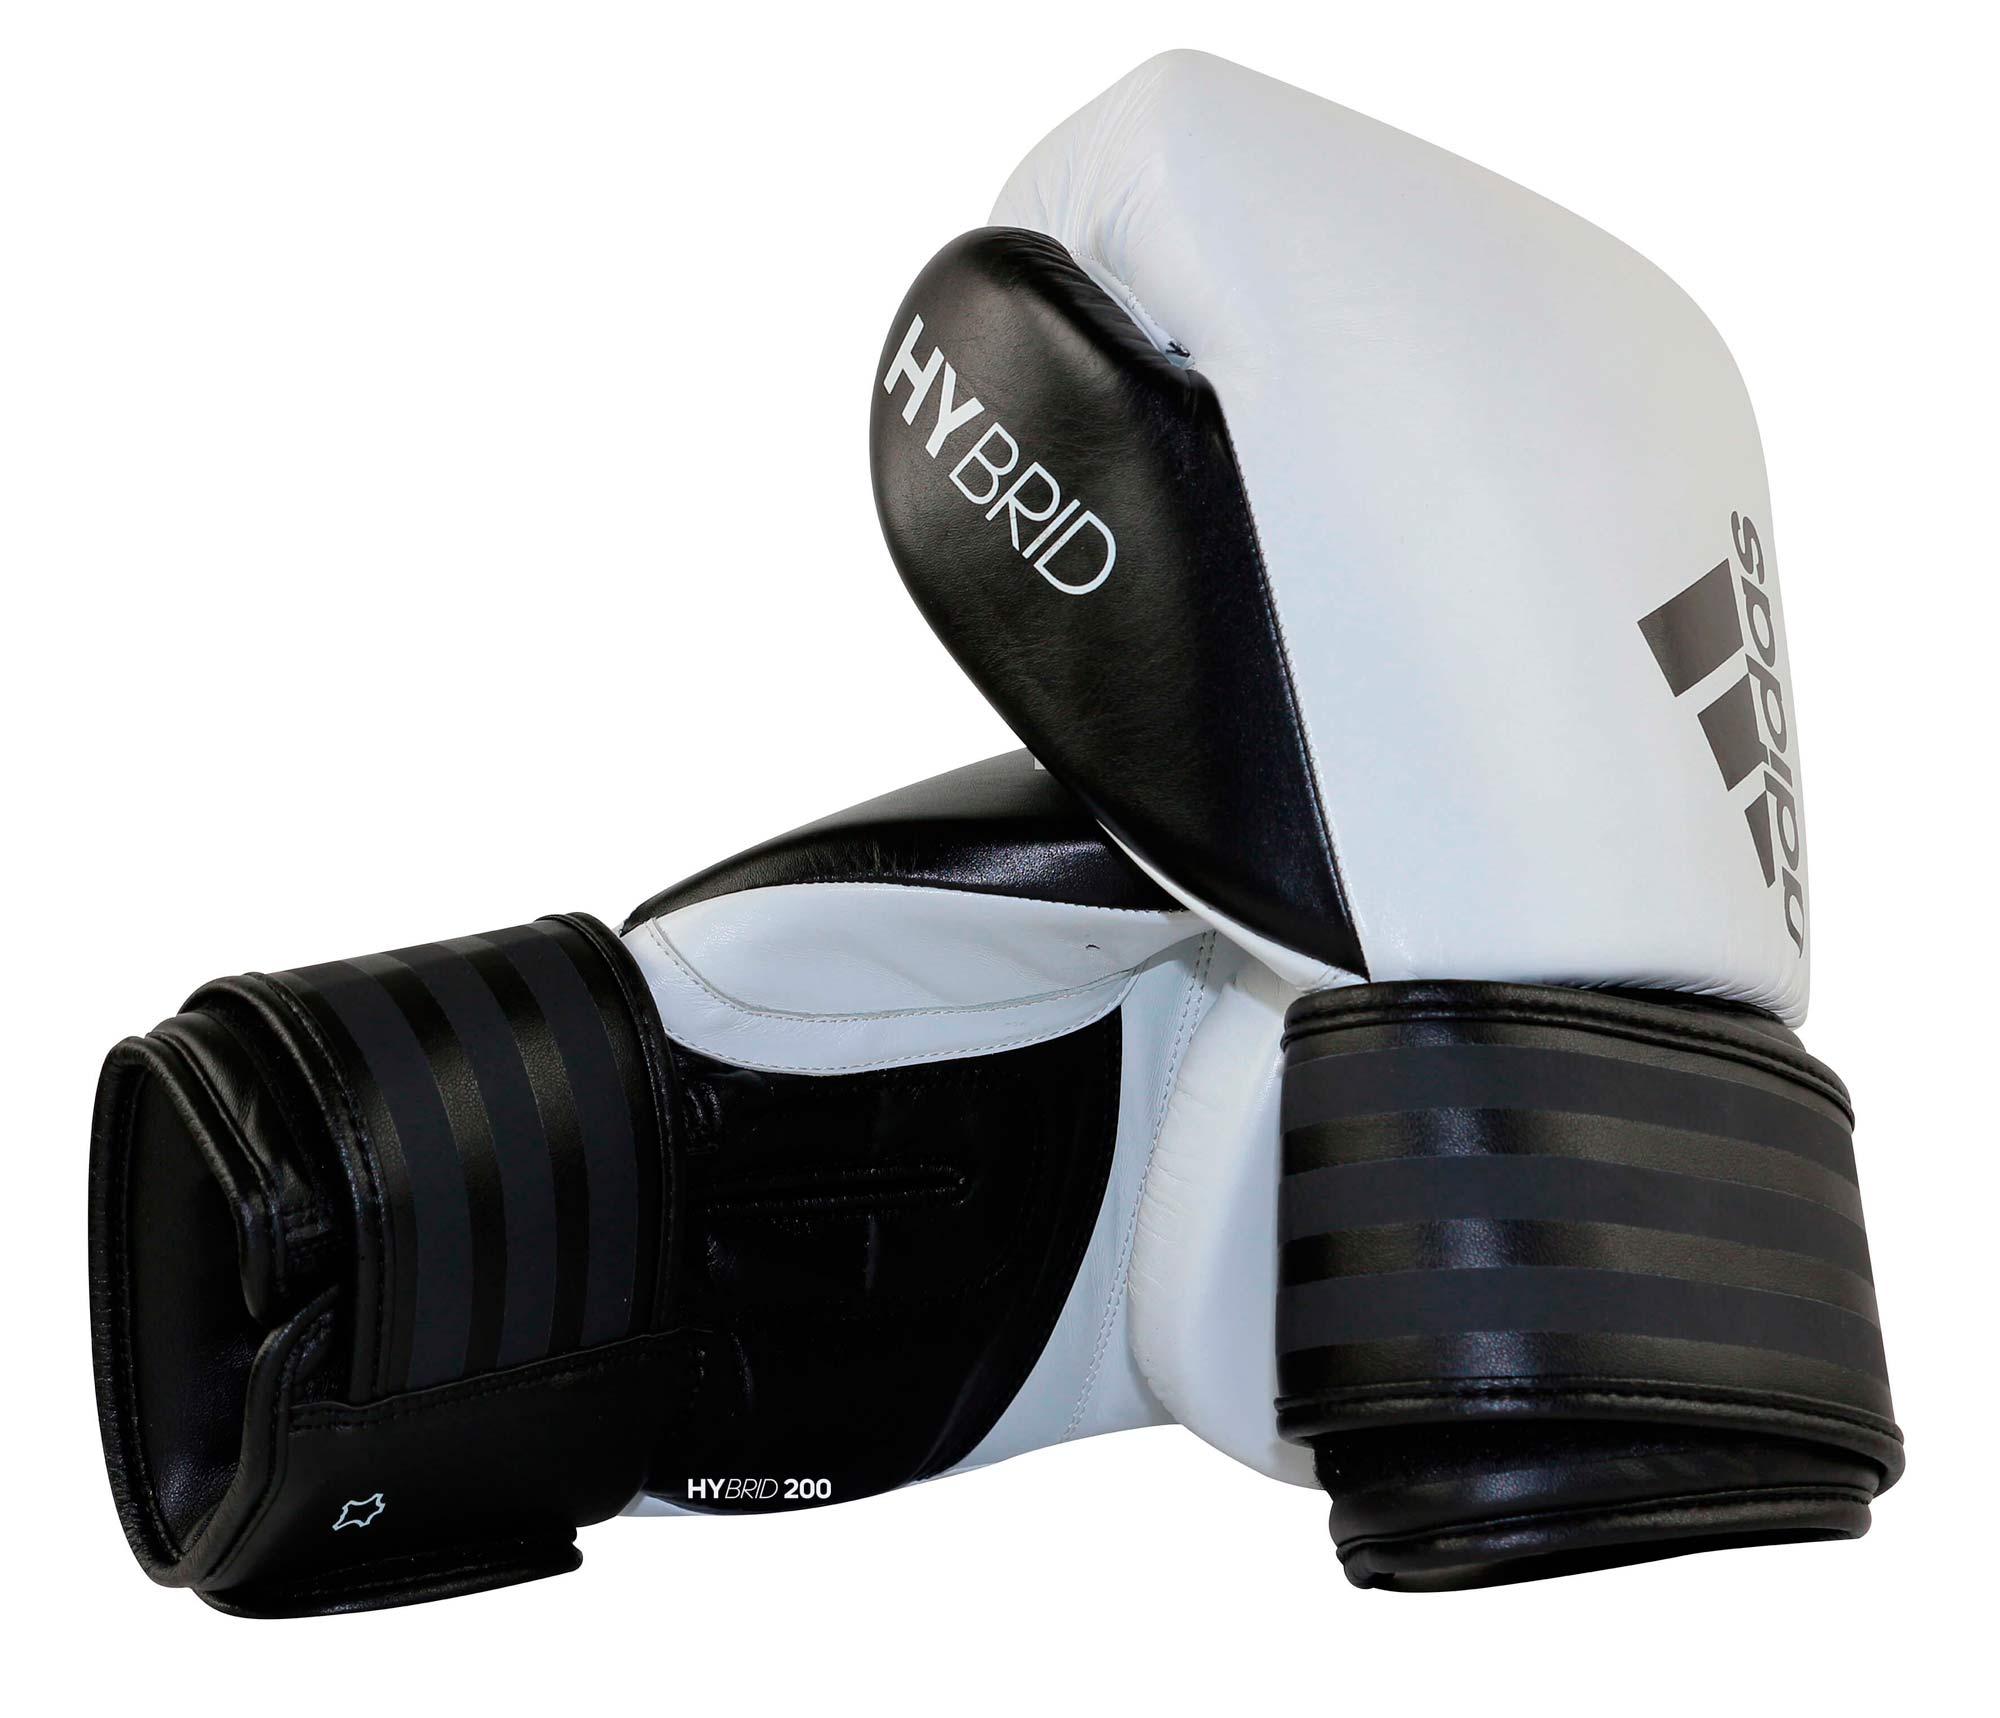 adidas Boxhandschuhe Hybrid 200, weißschwarz, ADIH200